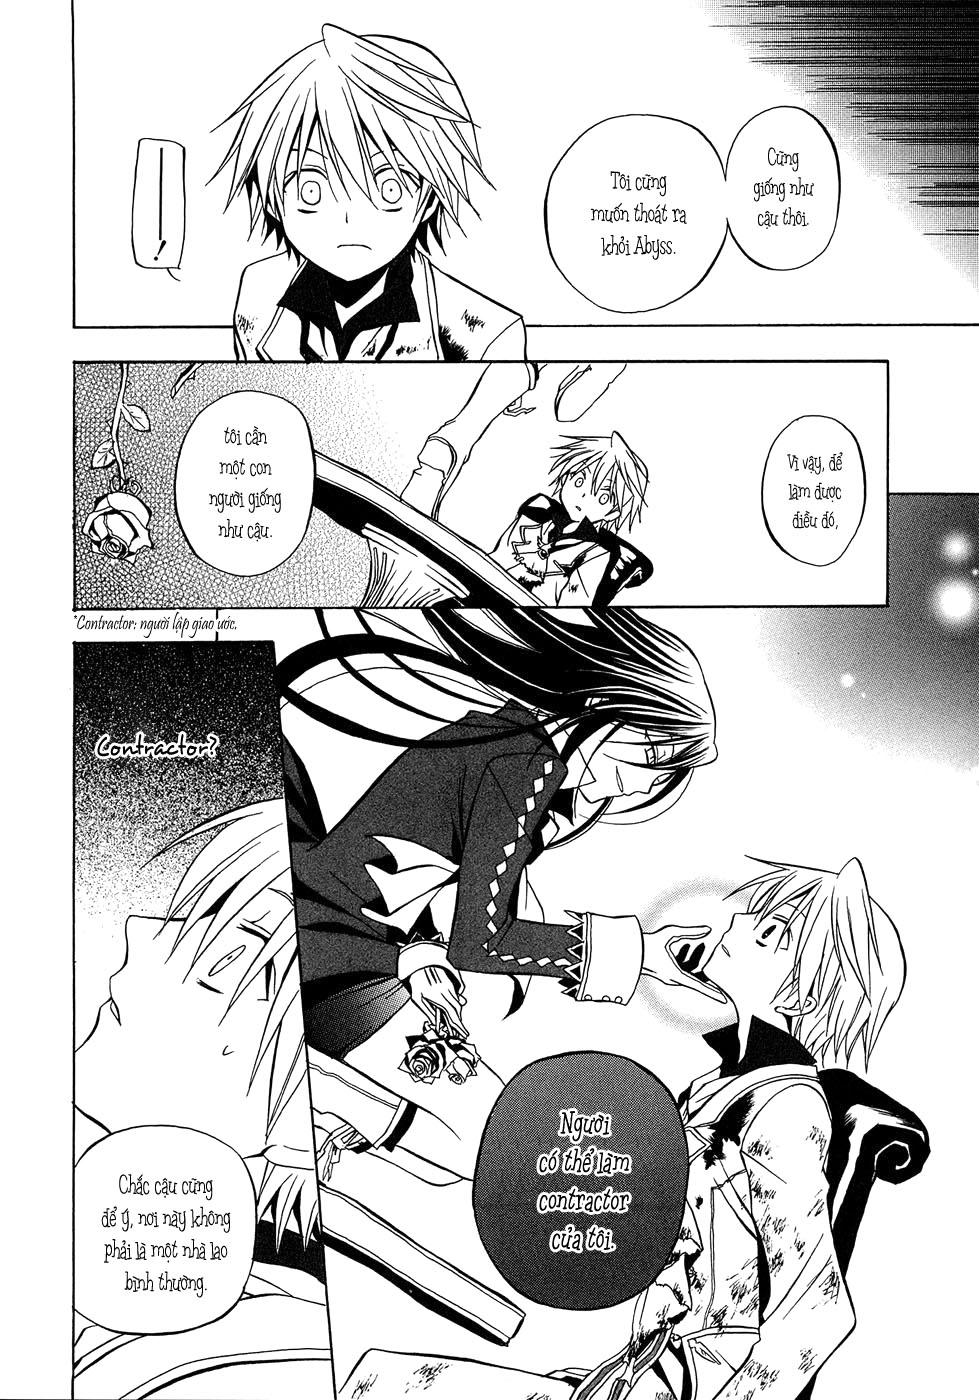 Pandora Hearts chương 003 - retrace: iii prisoner & alichino trang 15